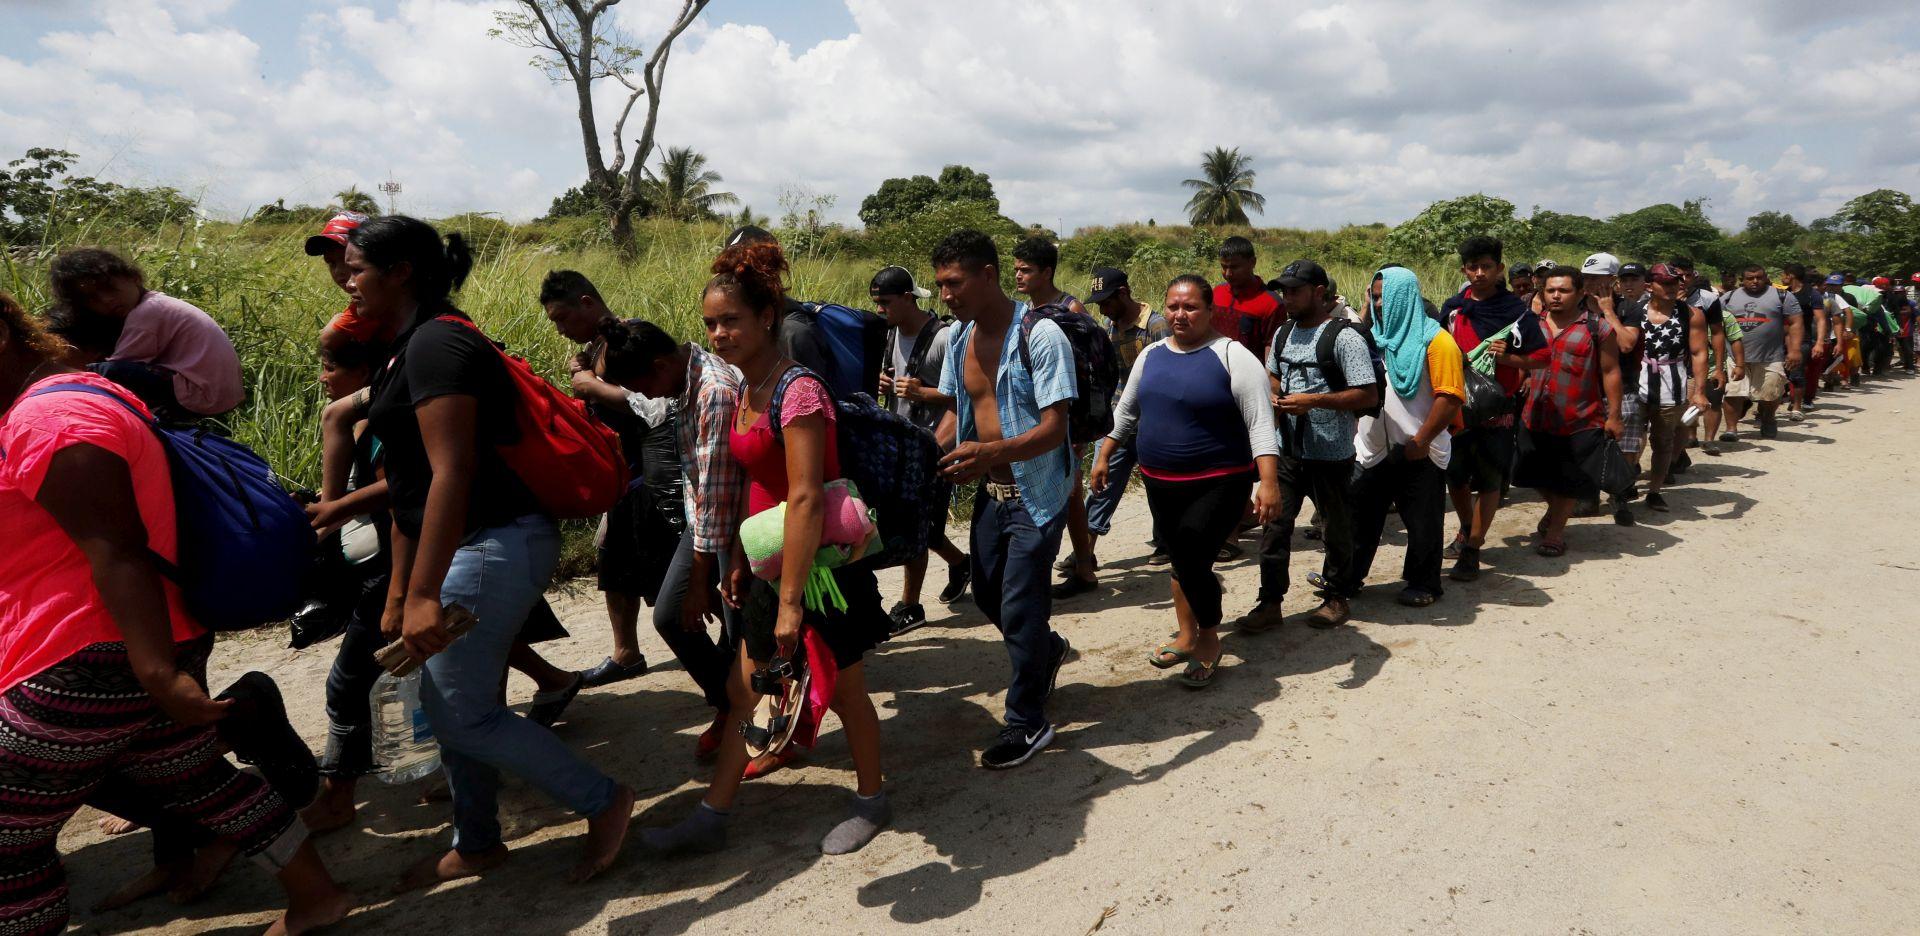 Jedan dan u karavani migranata